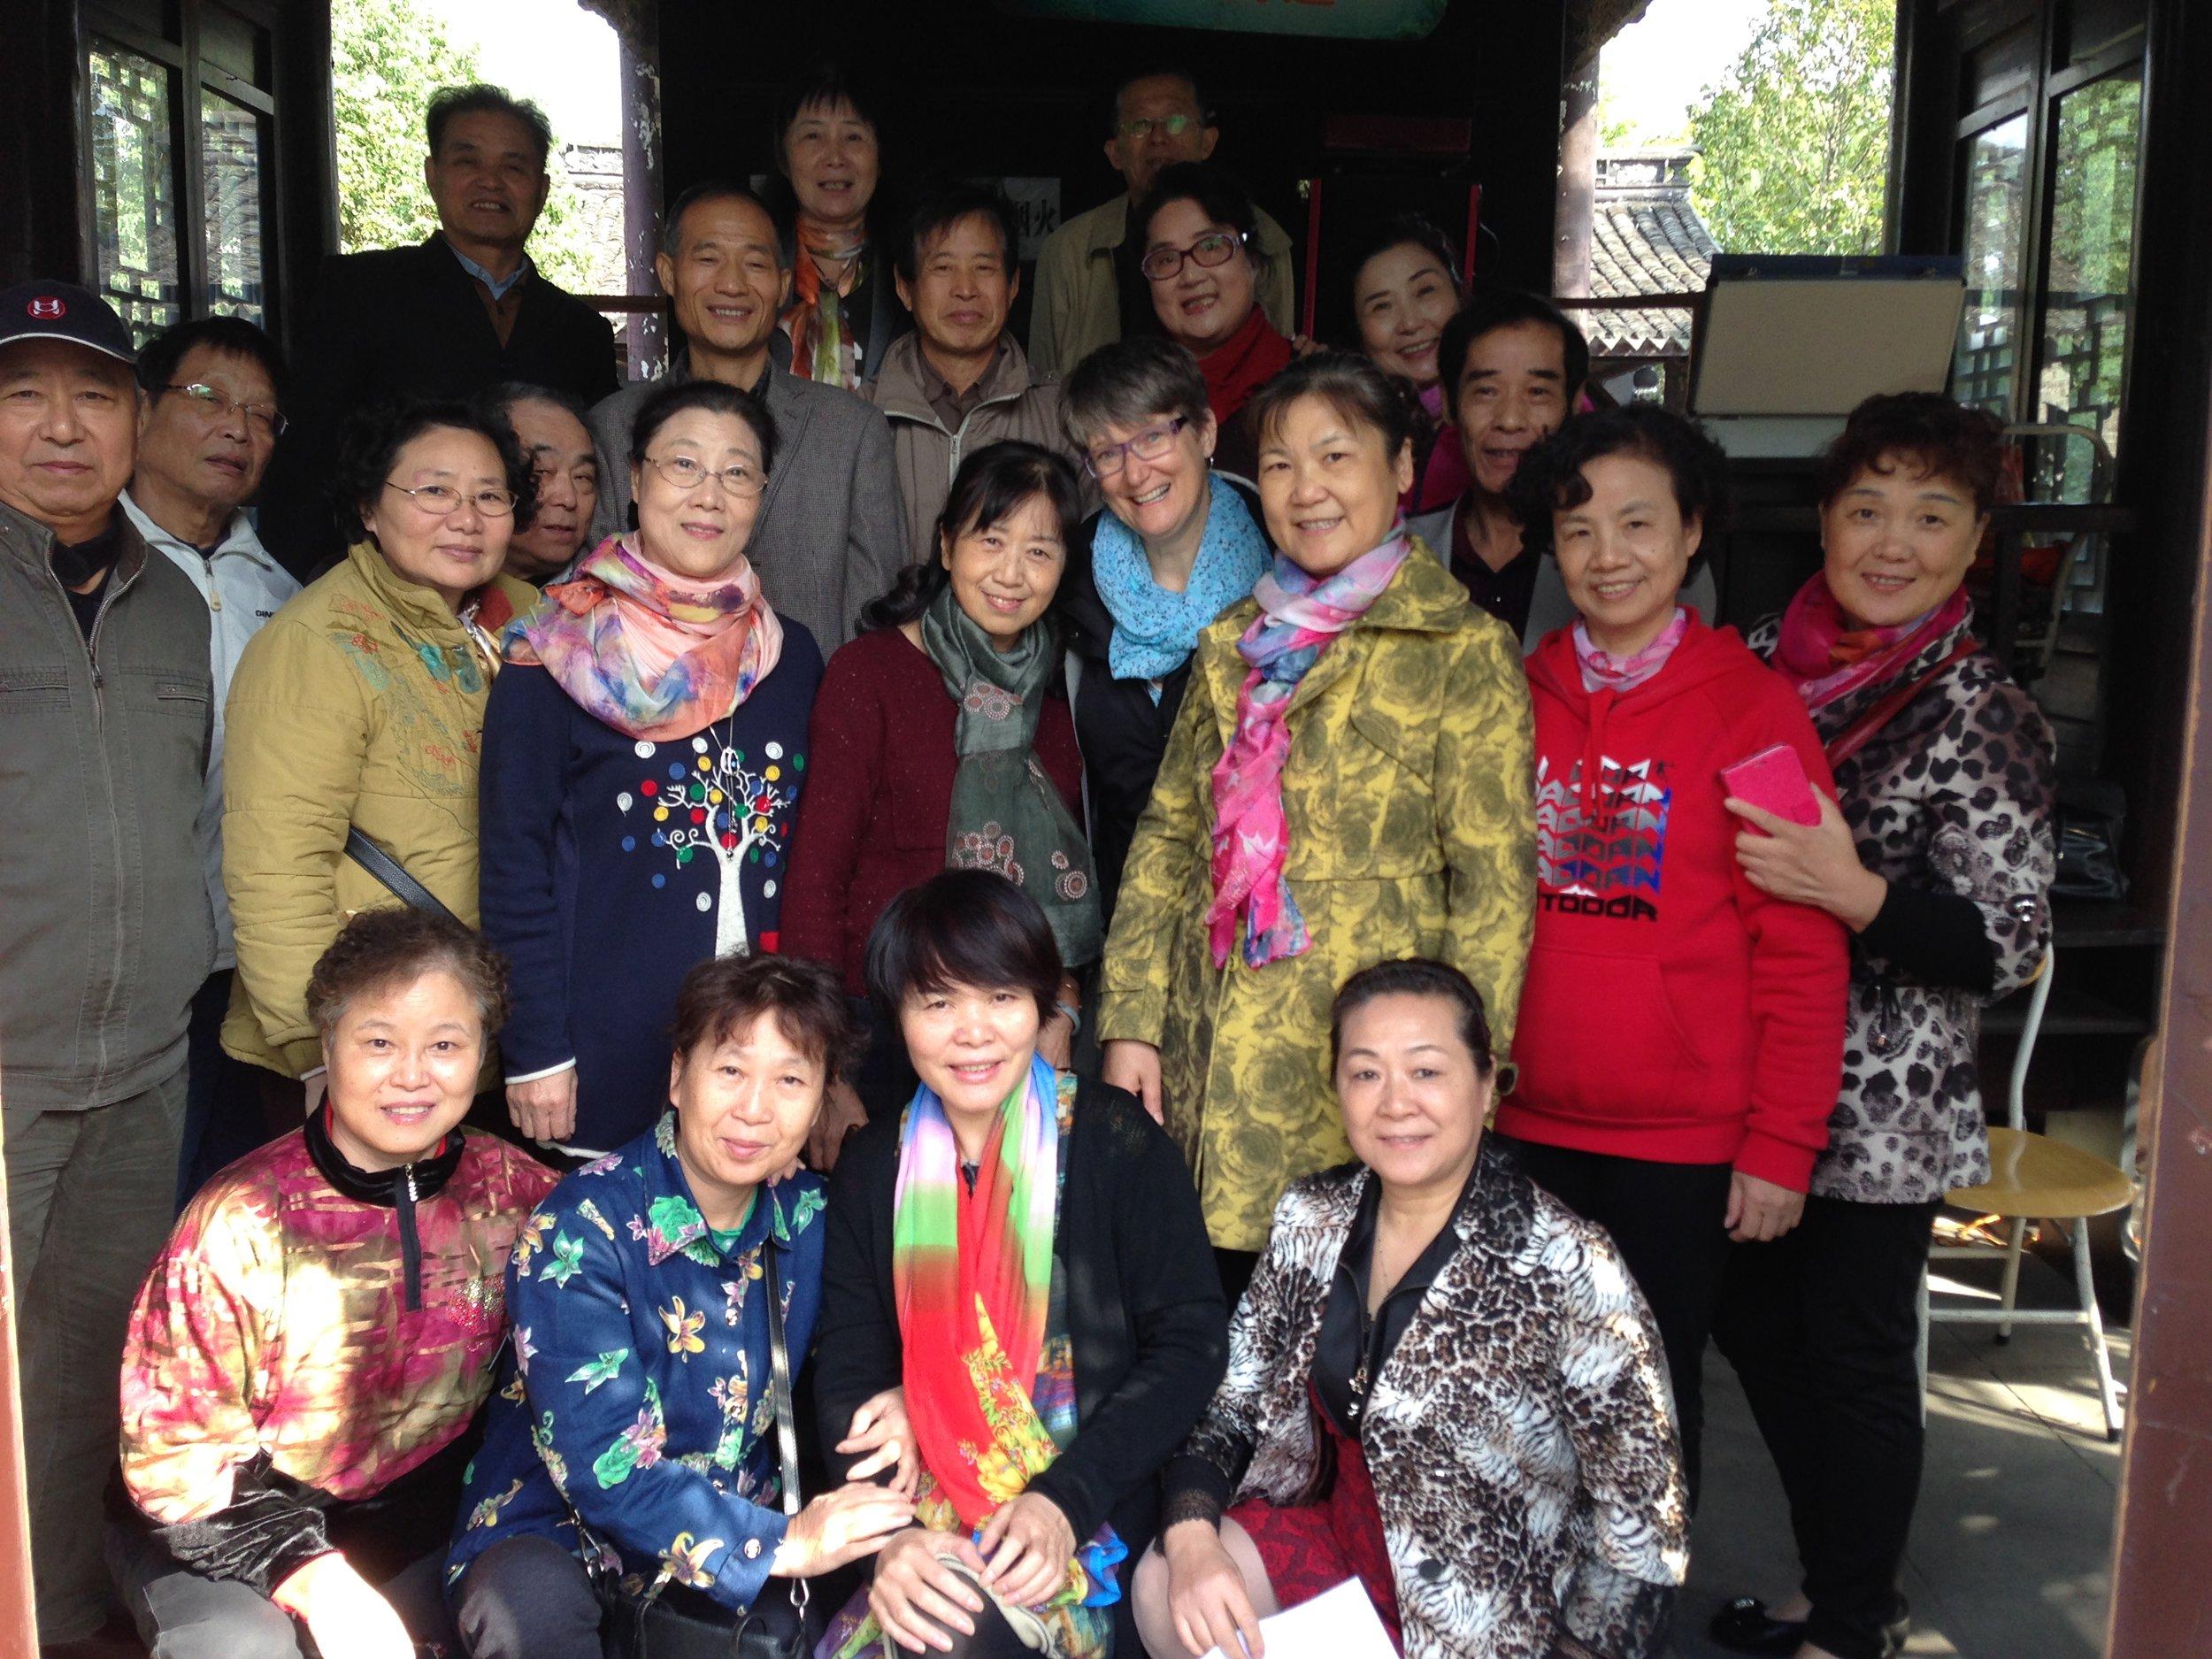 Ningbo group